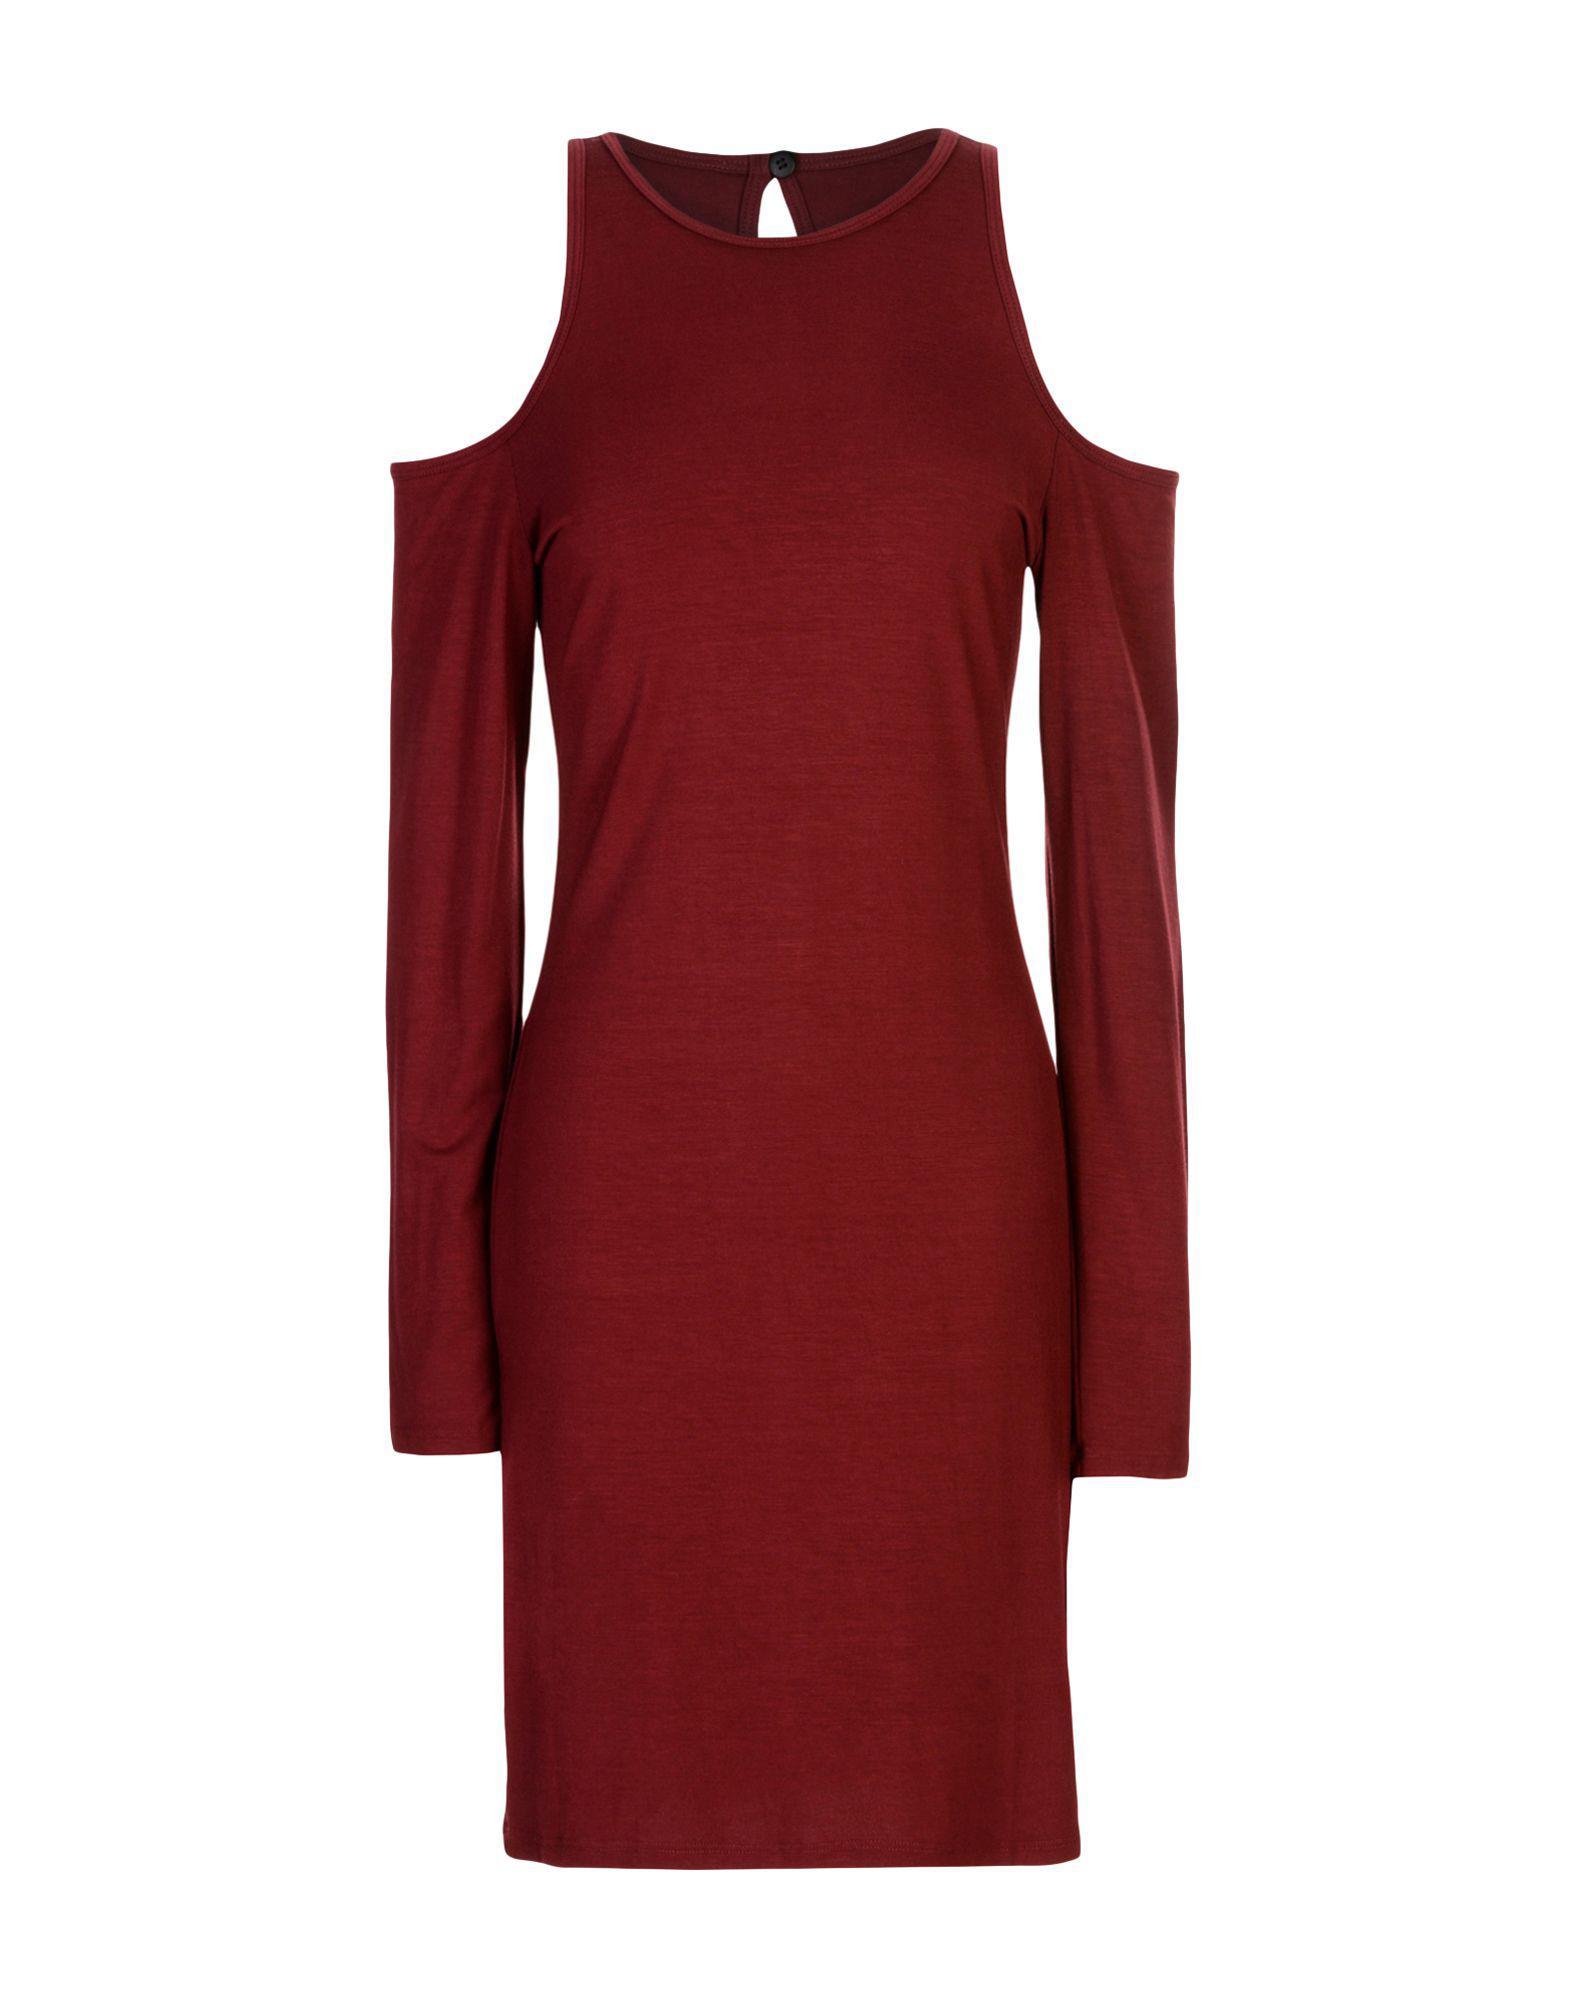 DRESSES - Short dresses Kain d4TEBH3